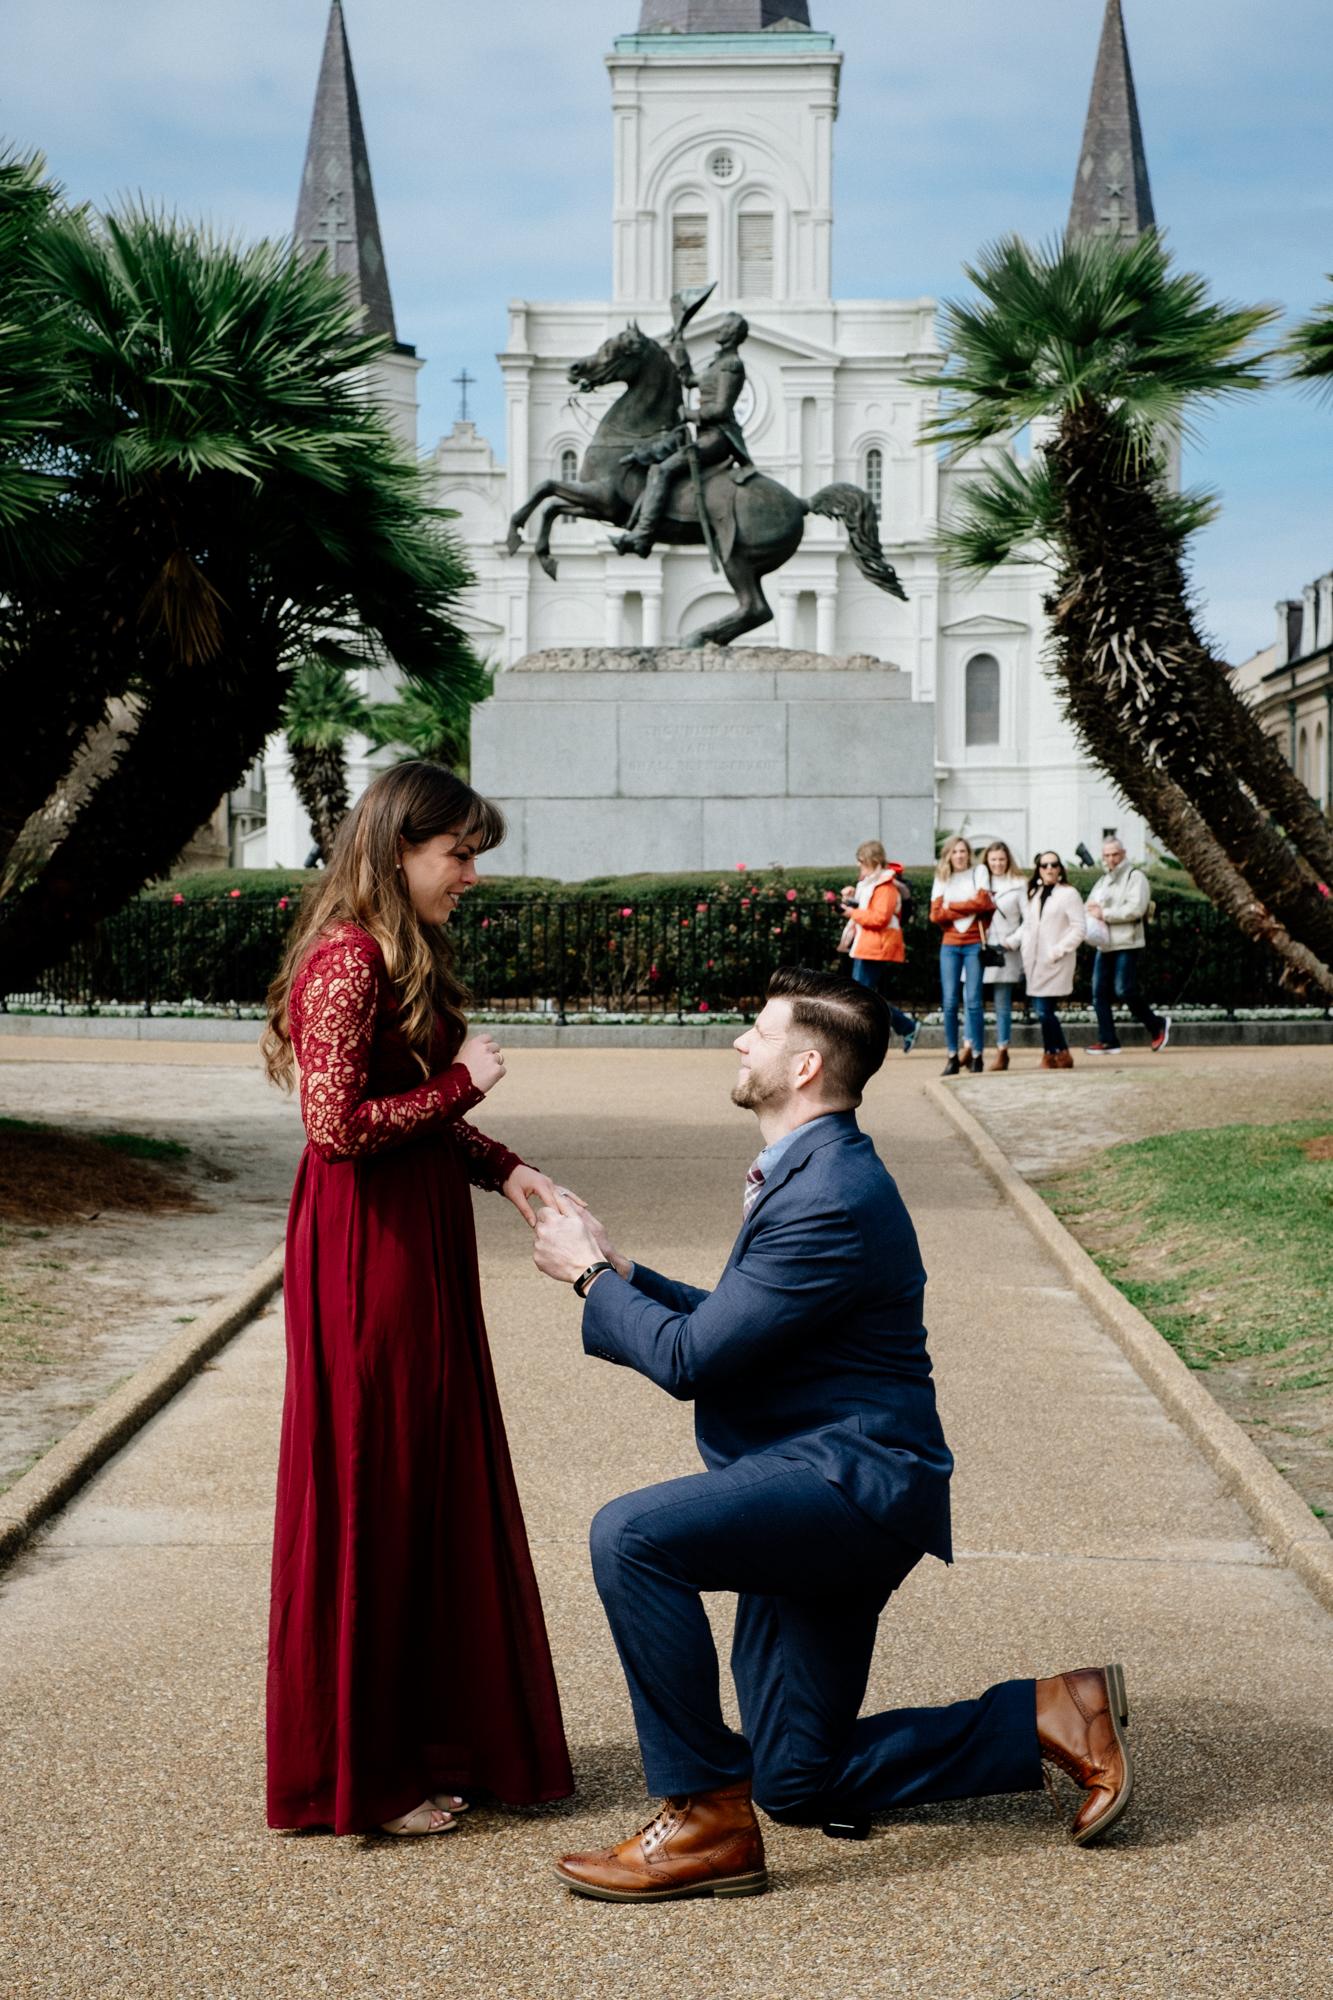 Jen_Montgomery_Photography_Angela_Brian_Engagement_Proposal_FB-16.jpg